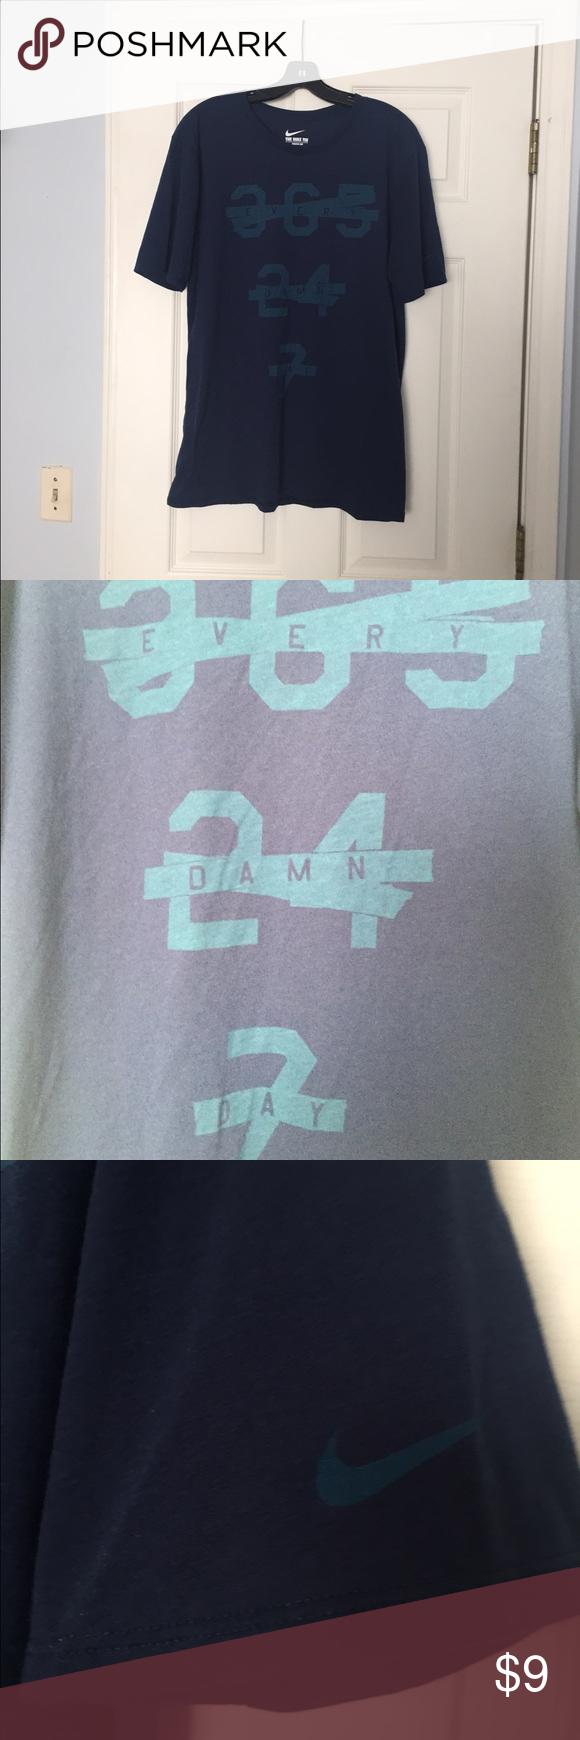 Nike Men's Shirt Dri- Fit 75% Polyester 13% Cotton 12% Rayon Nike Shirts Tees - Short Sleeve